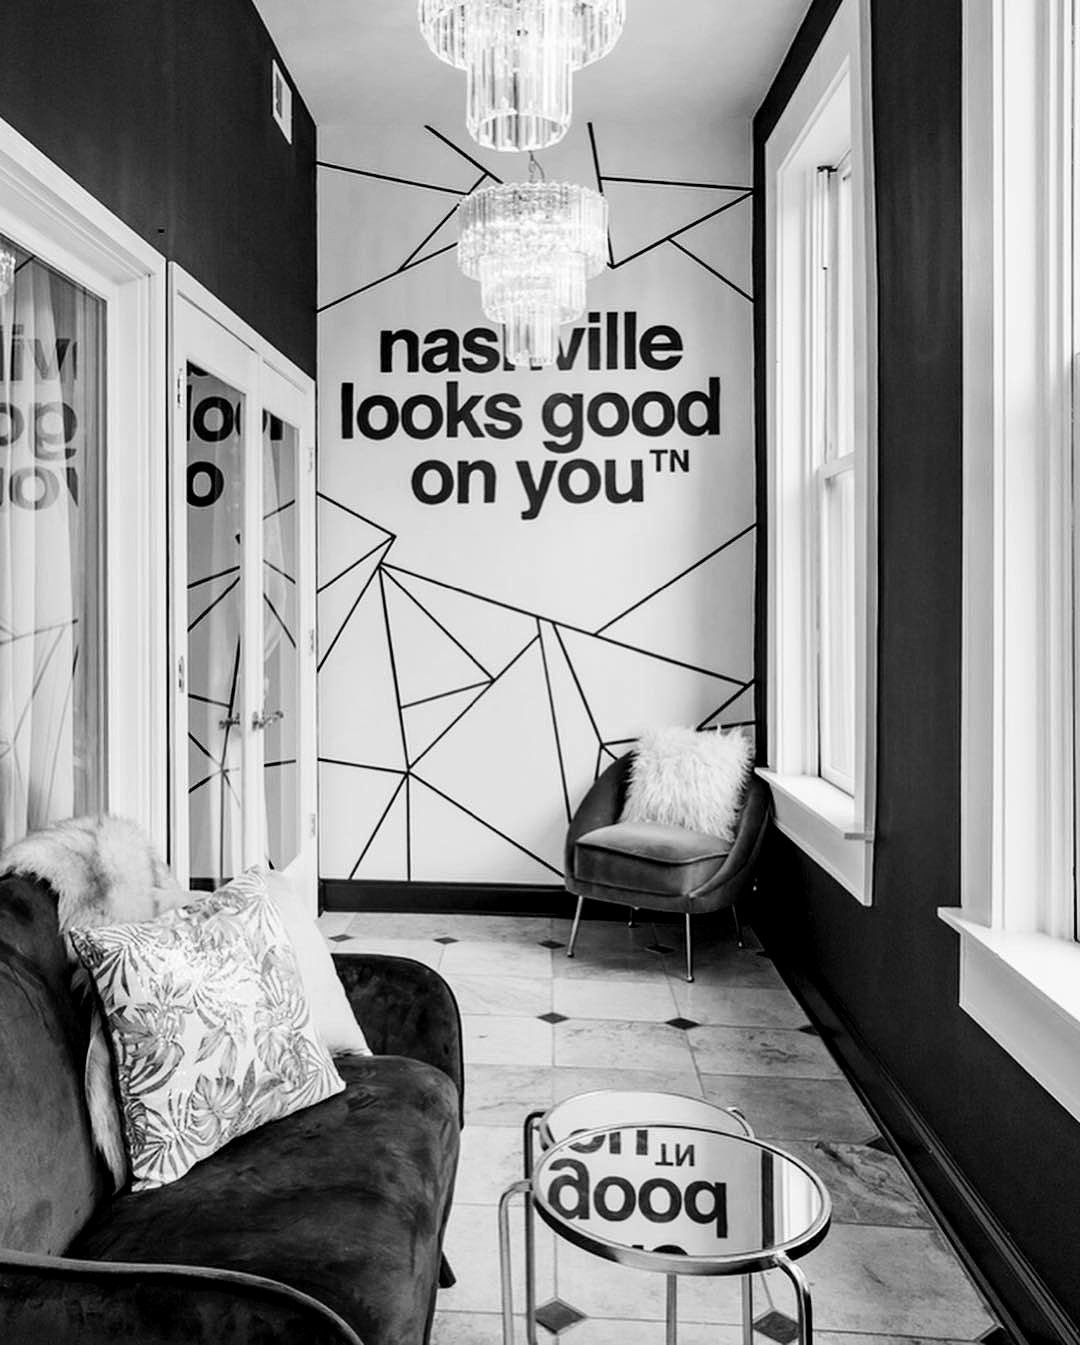 nashville looks good on you mural location downtown broadway airbnb nashville nashville murals tennessee